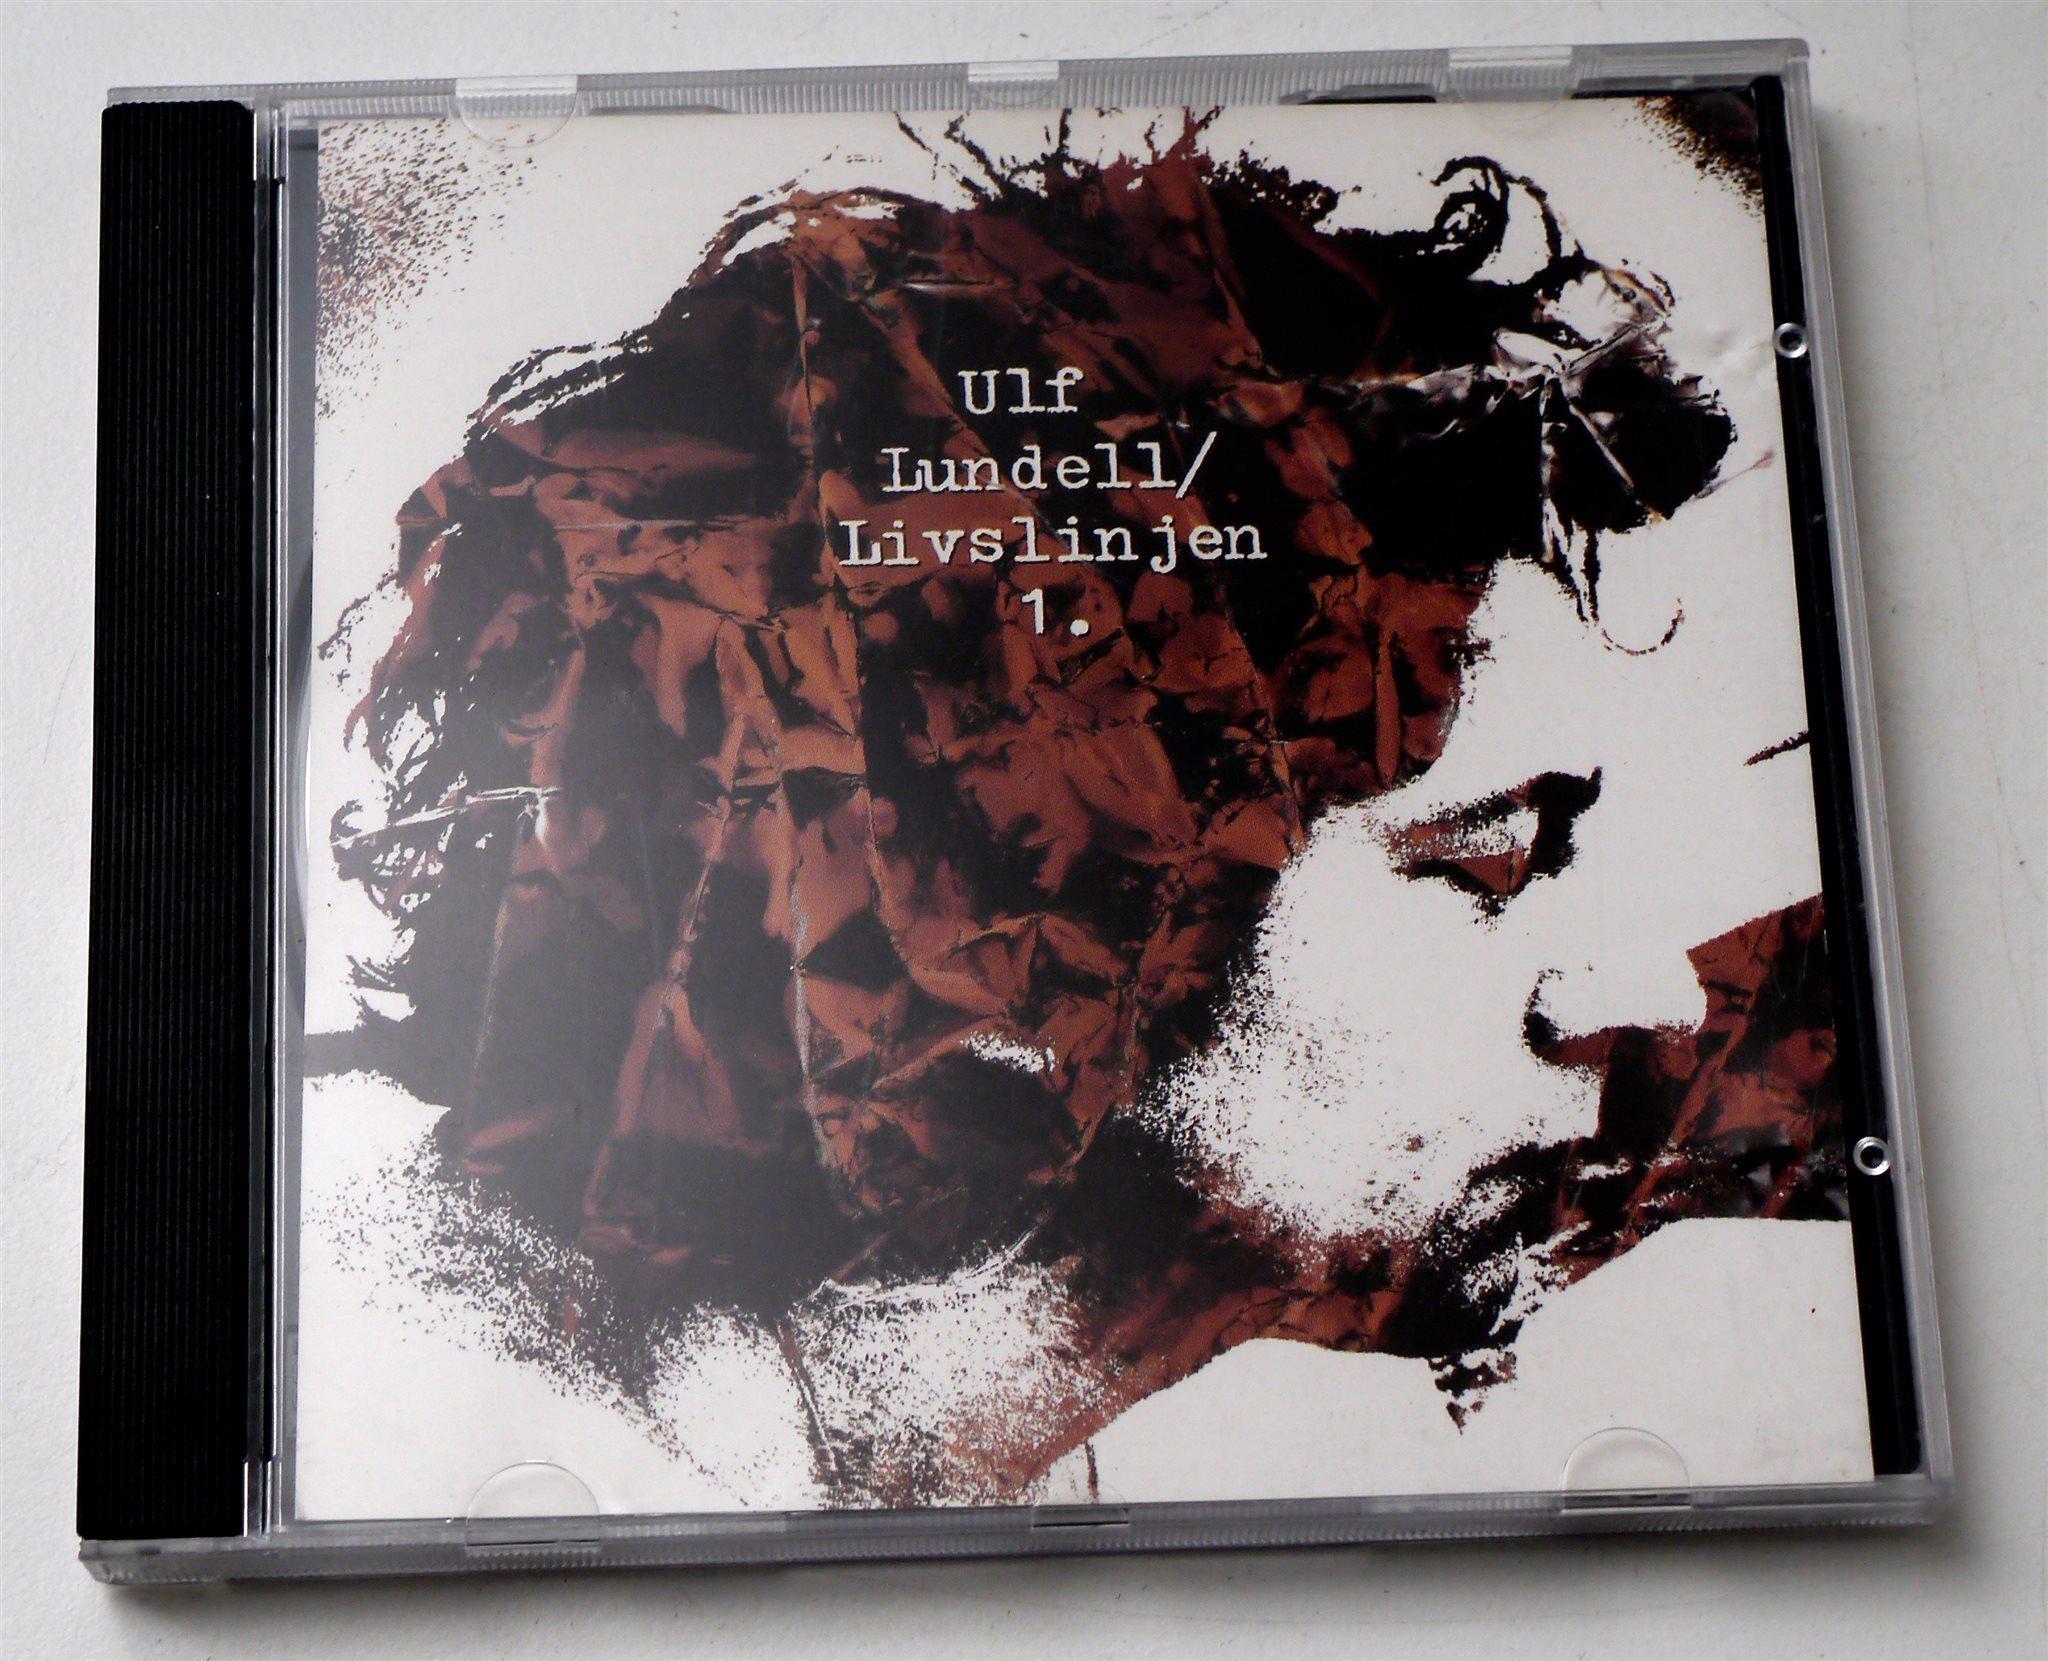 Ulf Lundell   Livslinjen 1 CD (328901816) ᐈ Köp på Tradera 10f3f67ab4ba2